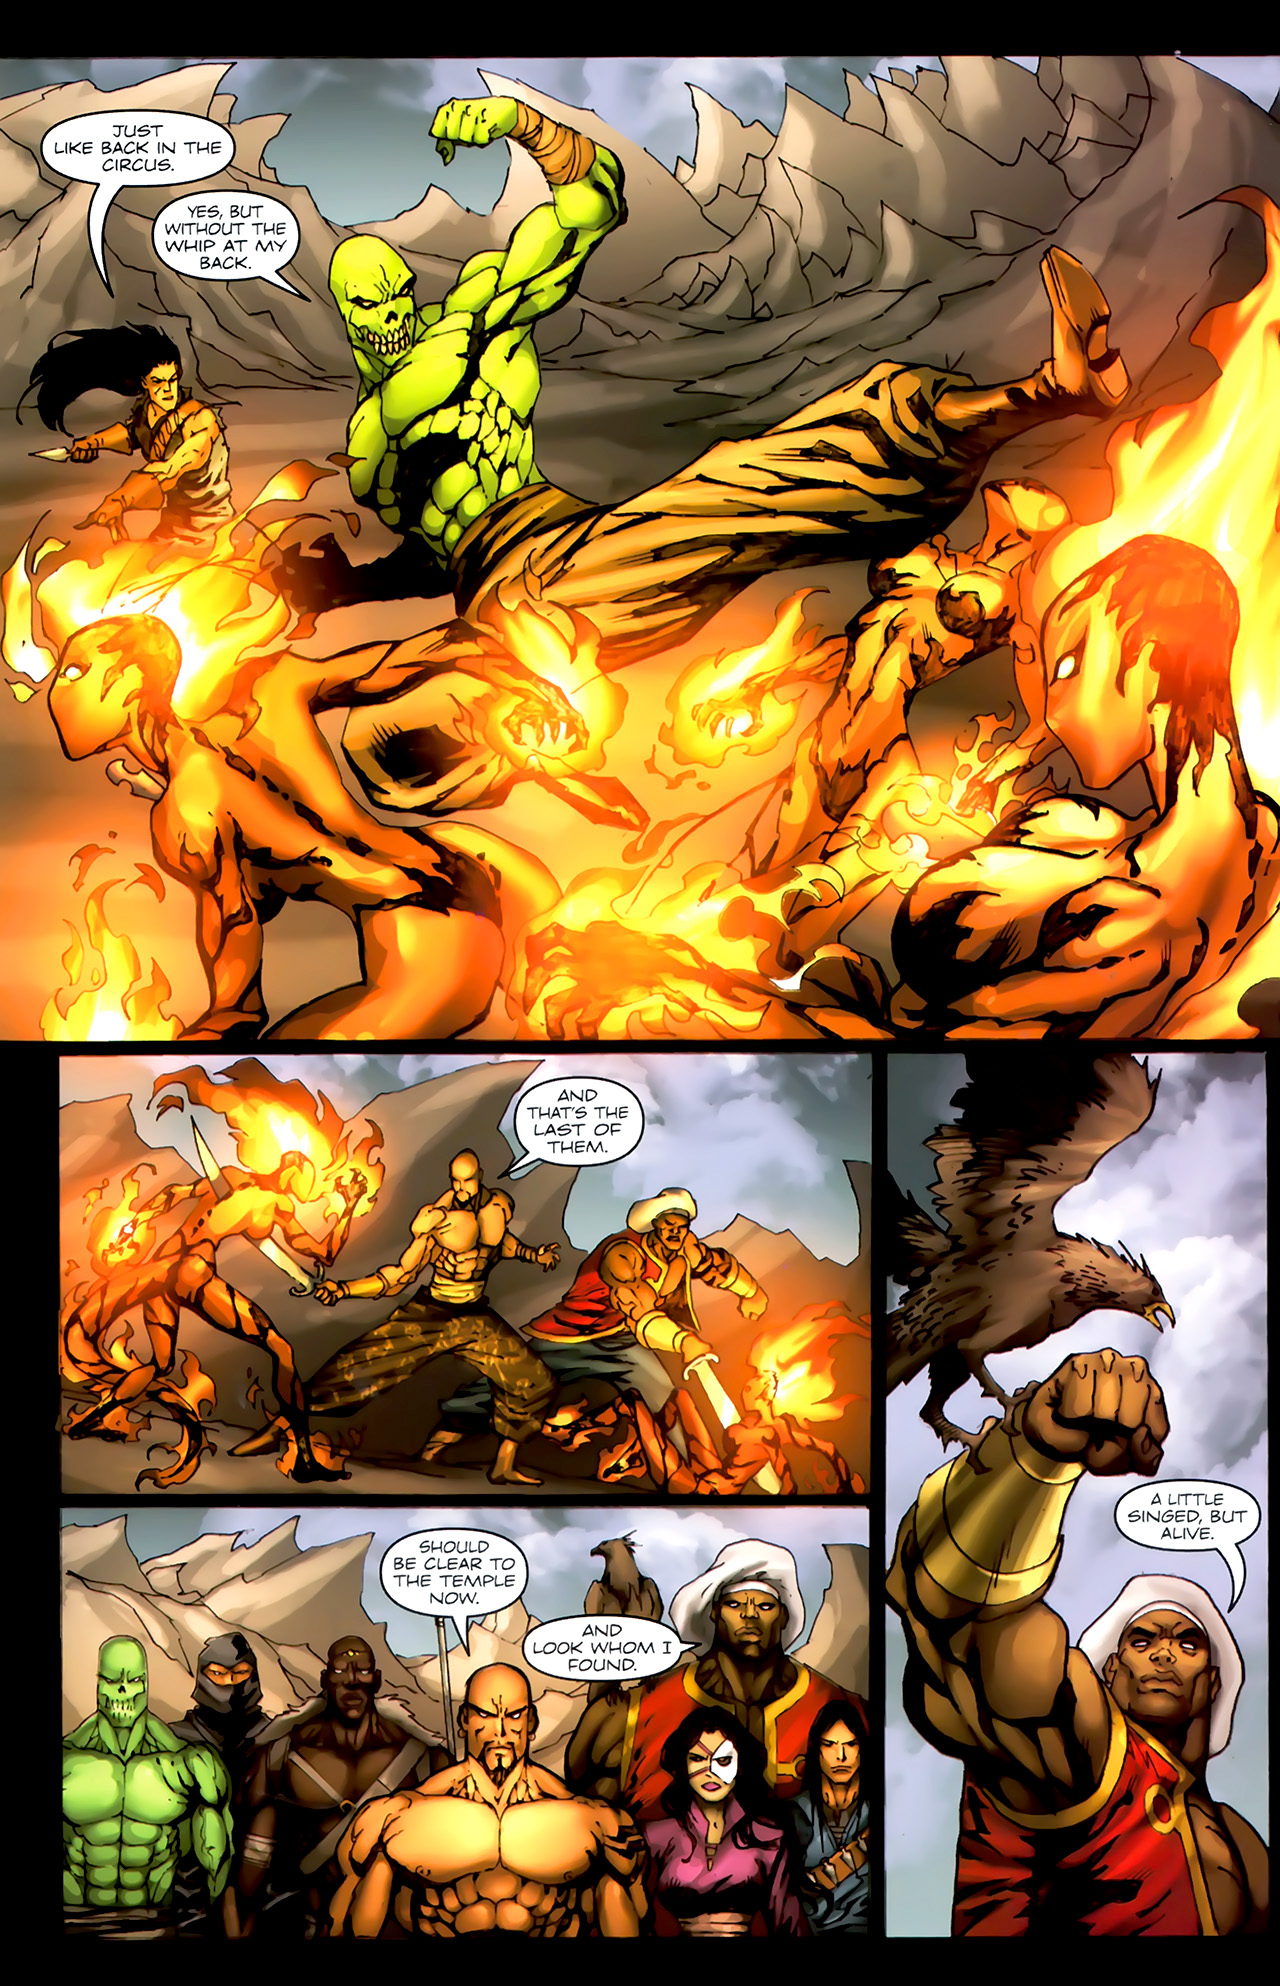 Read online 1001 Arabian Nights: The Adventures of Sinbad comic -  Issue #4 - 23